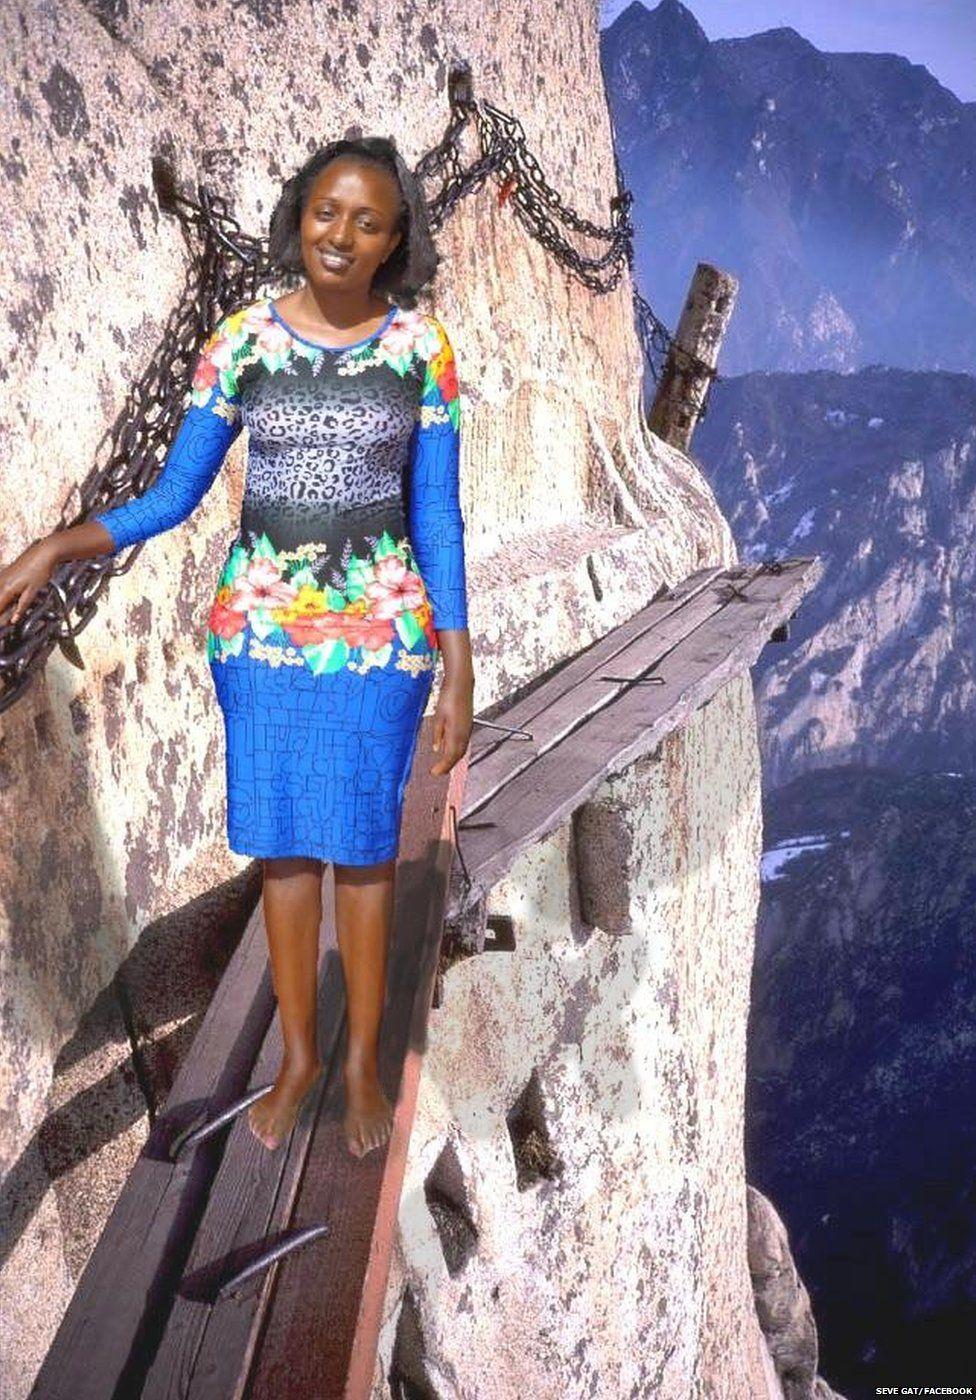 Kenyan woman edits herself into holiday photos with hilarious consequences